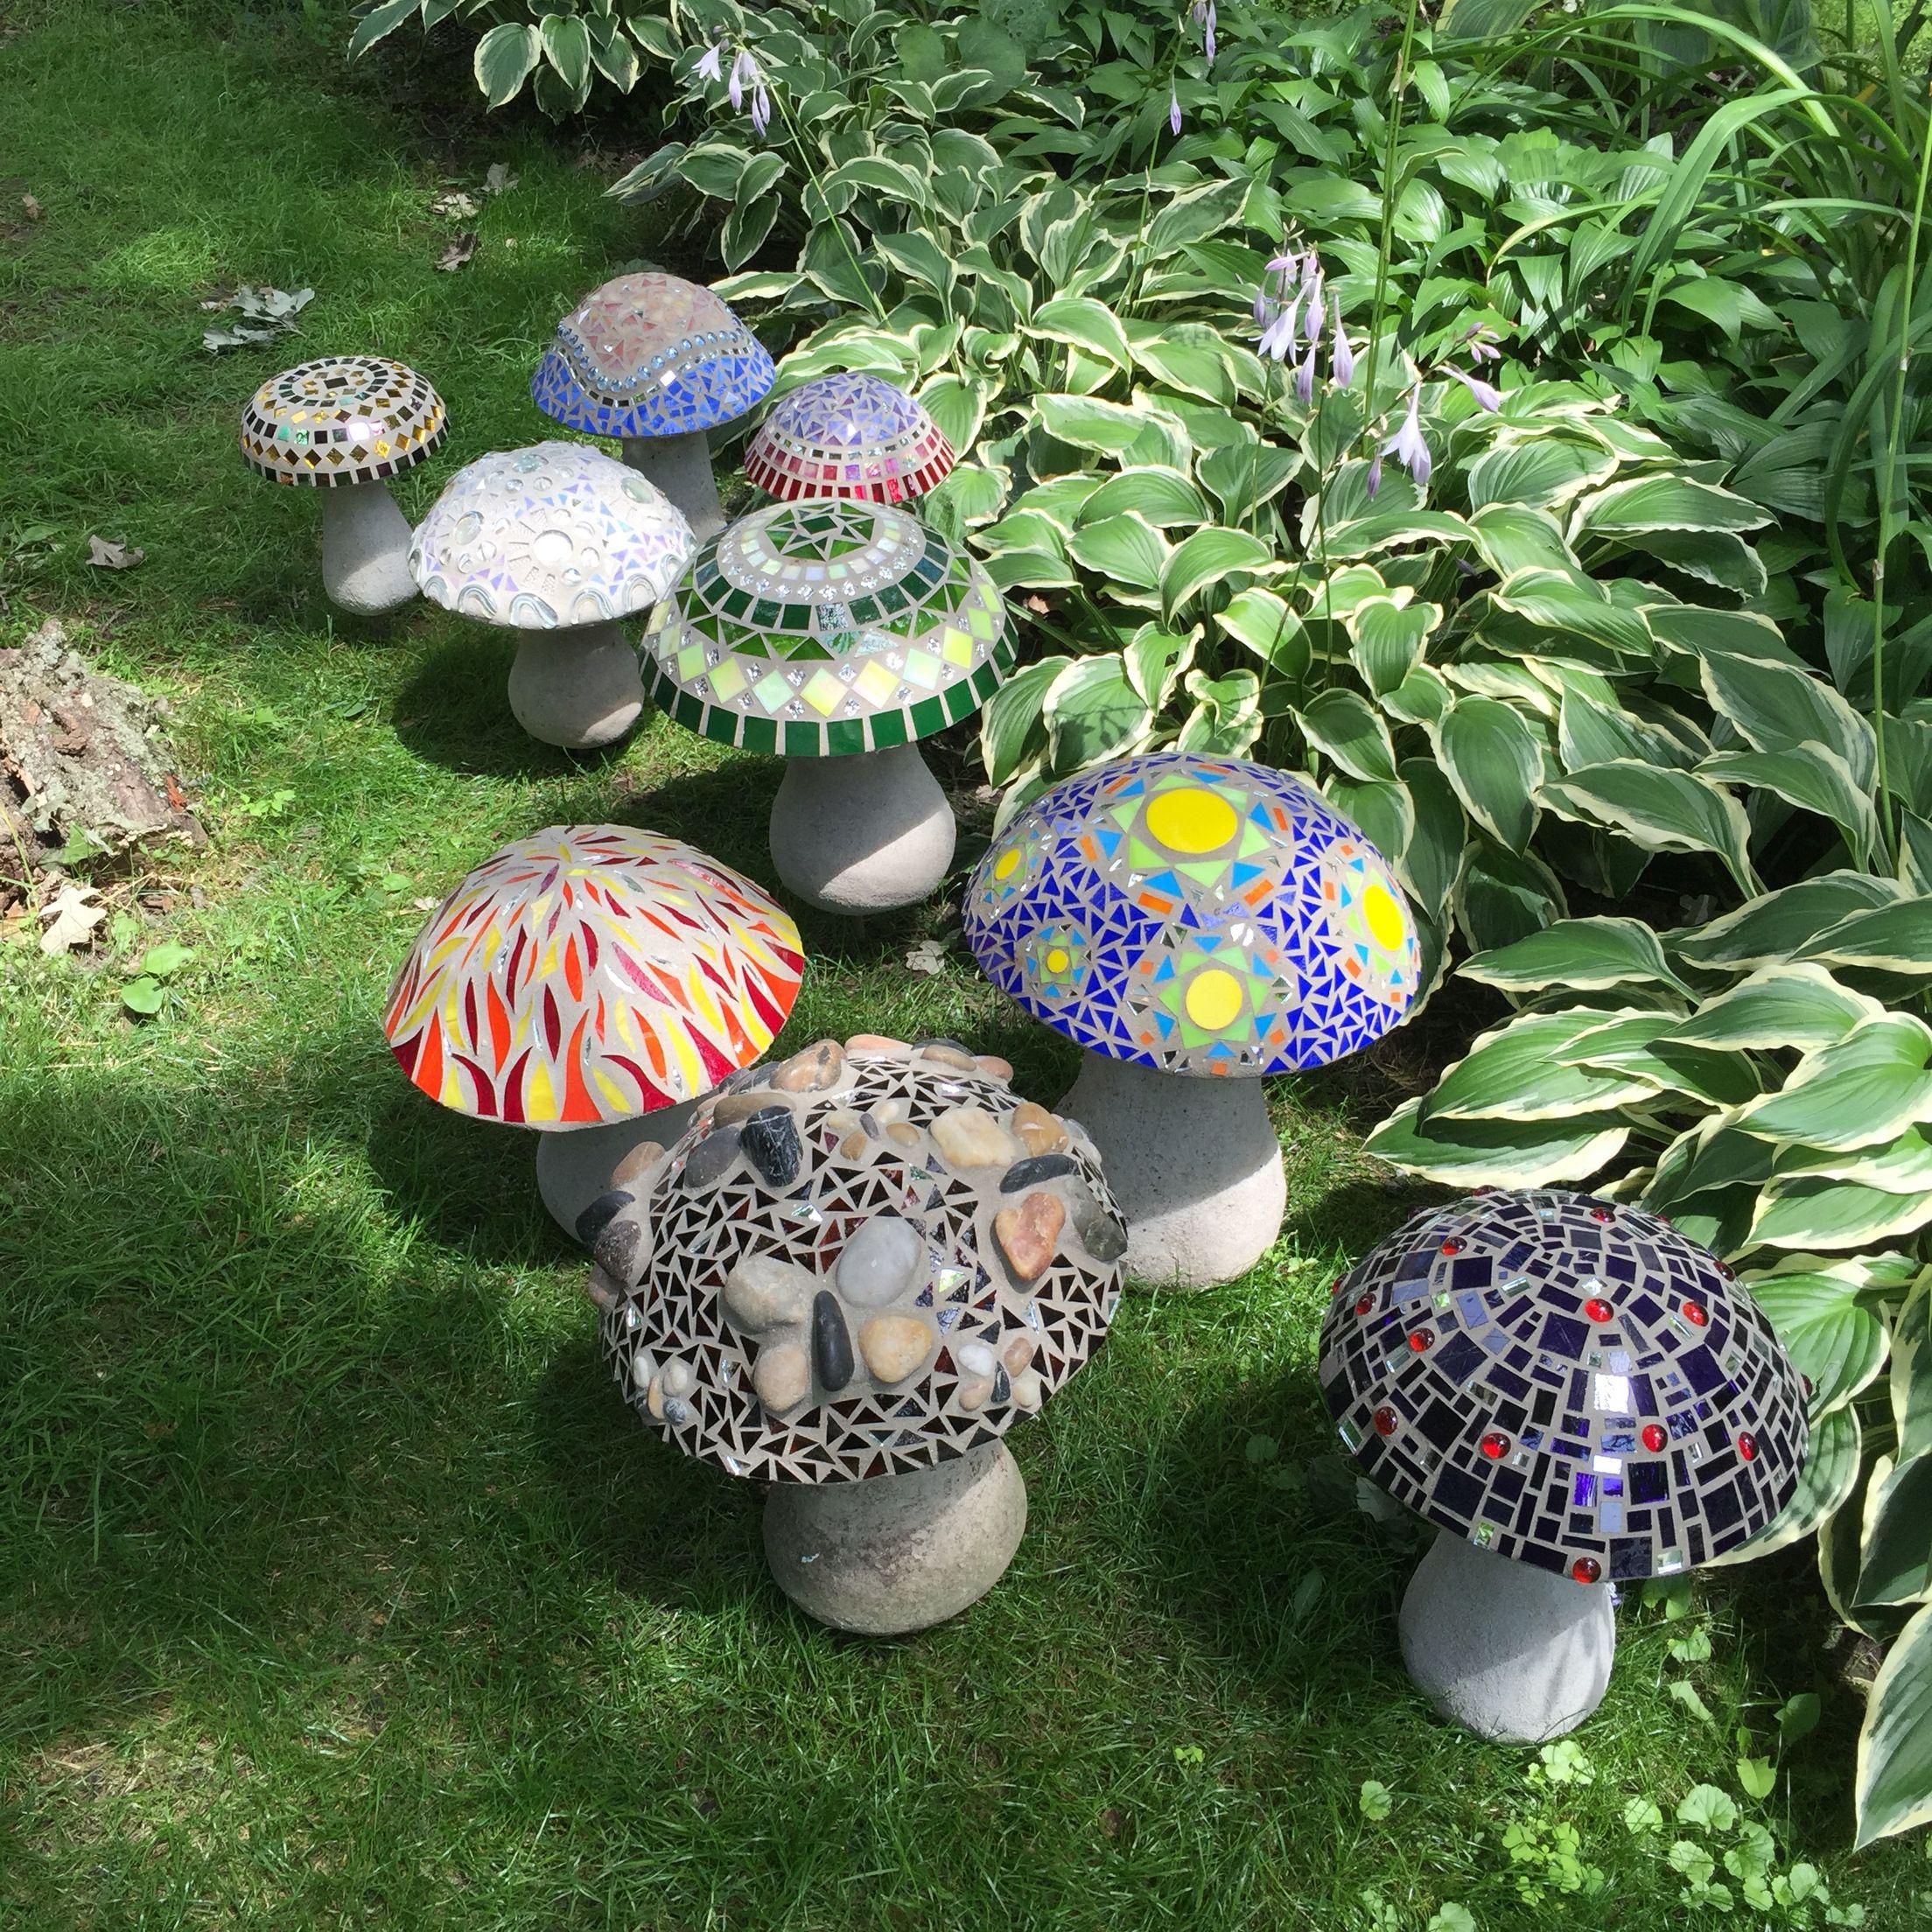 Cement Garden Art: Concrete Mosaic Mushrooms …